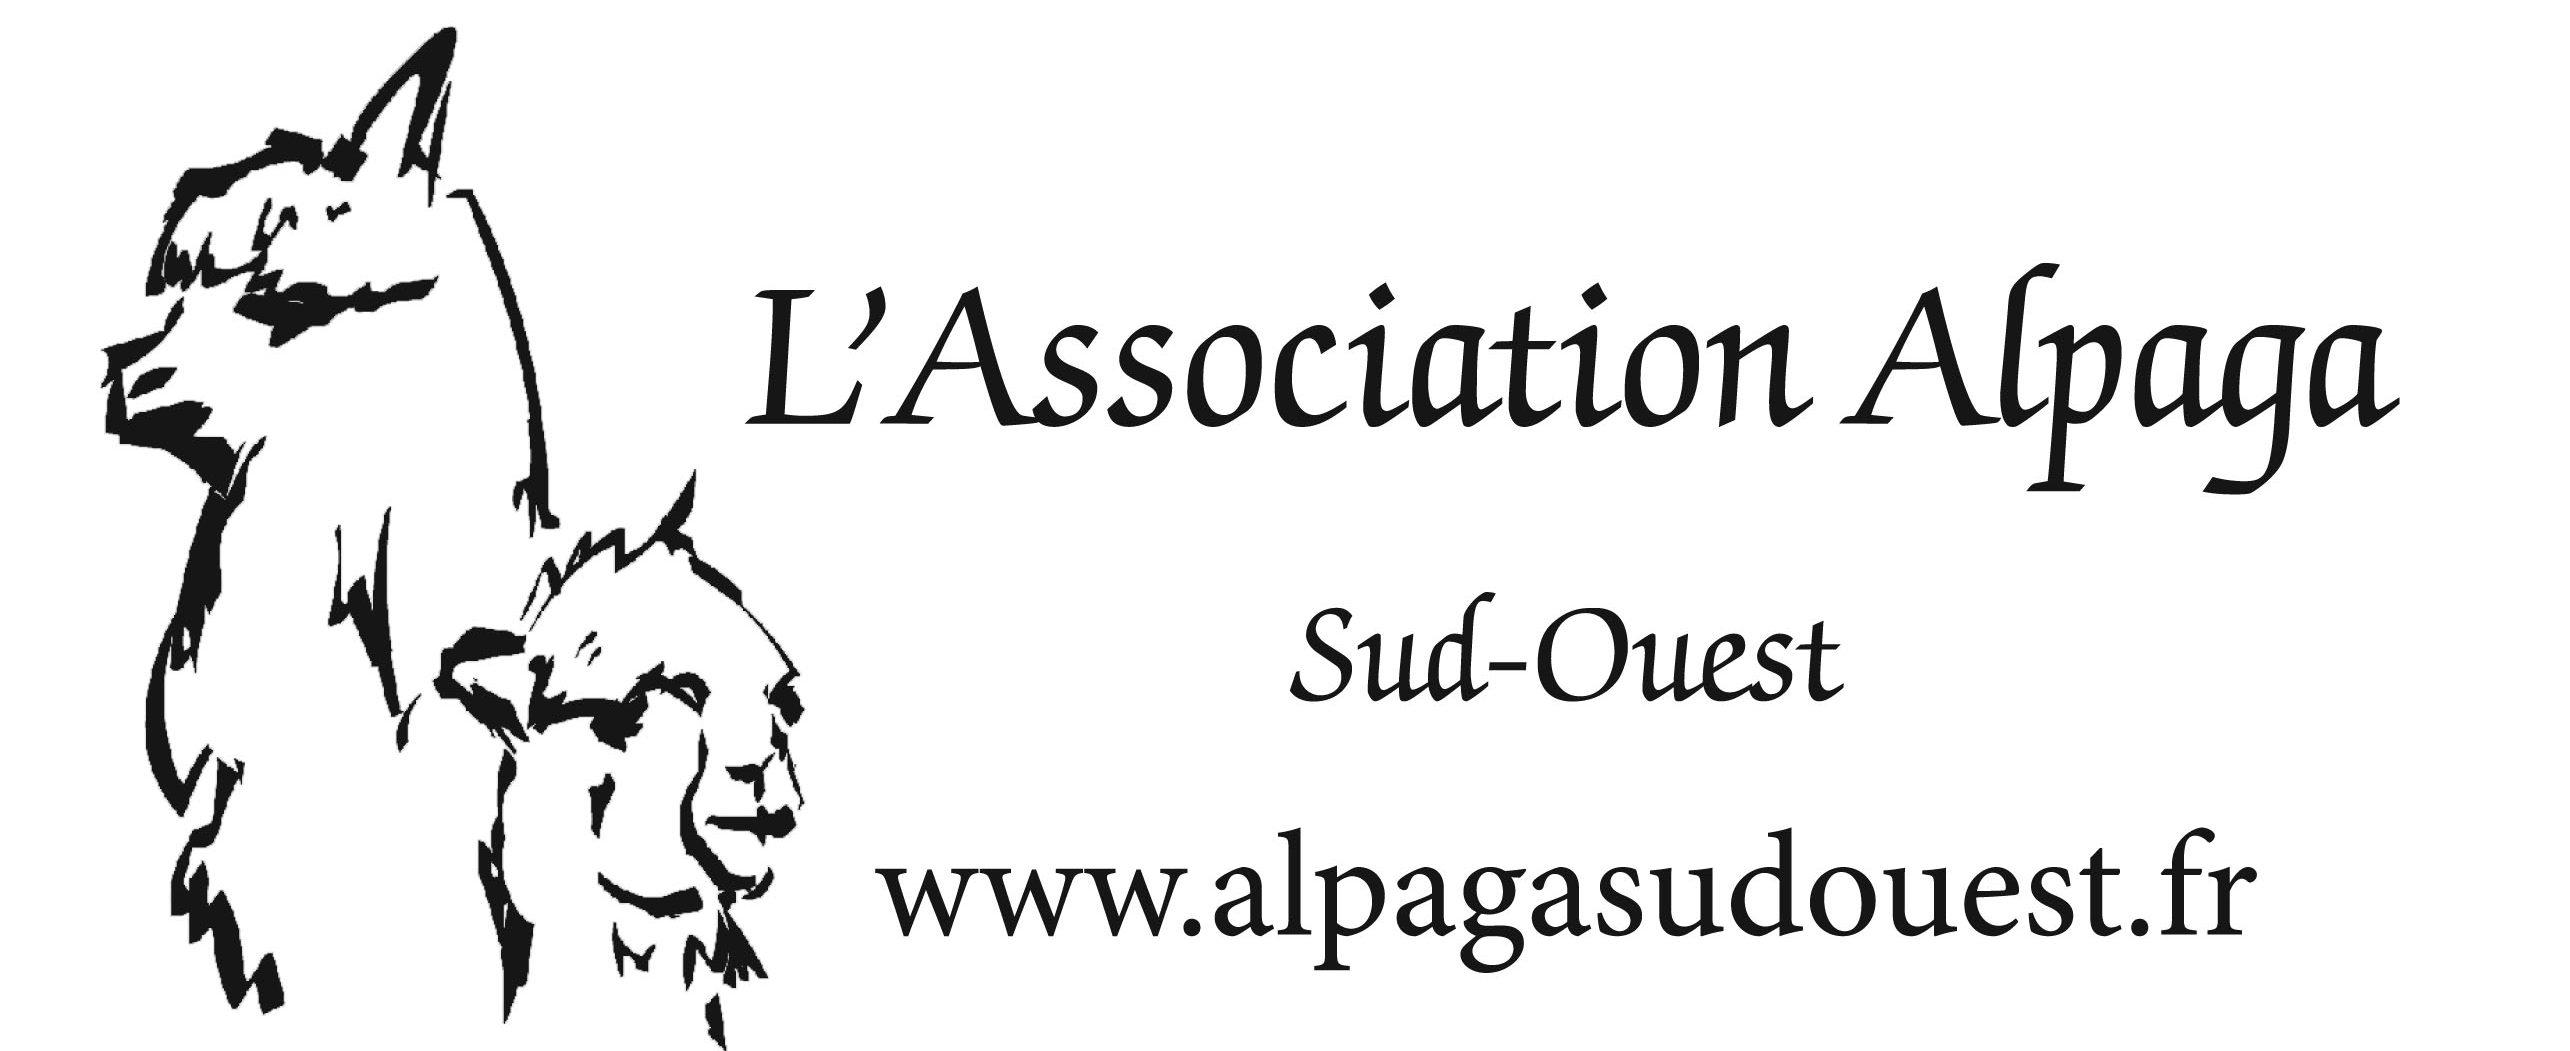 L'Association Alpaga Sud-Ouest